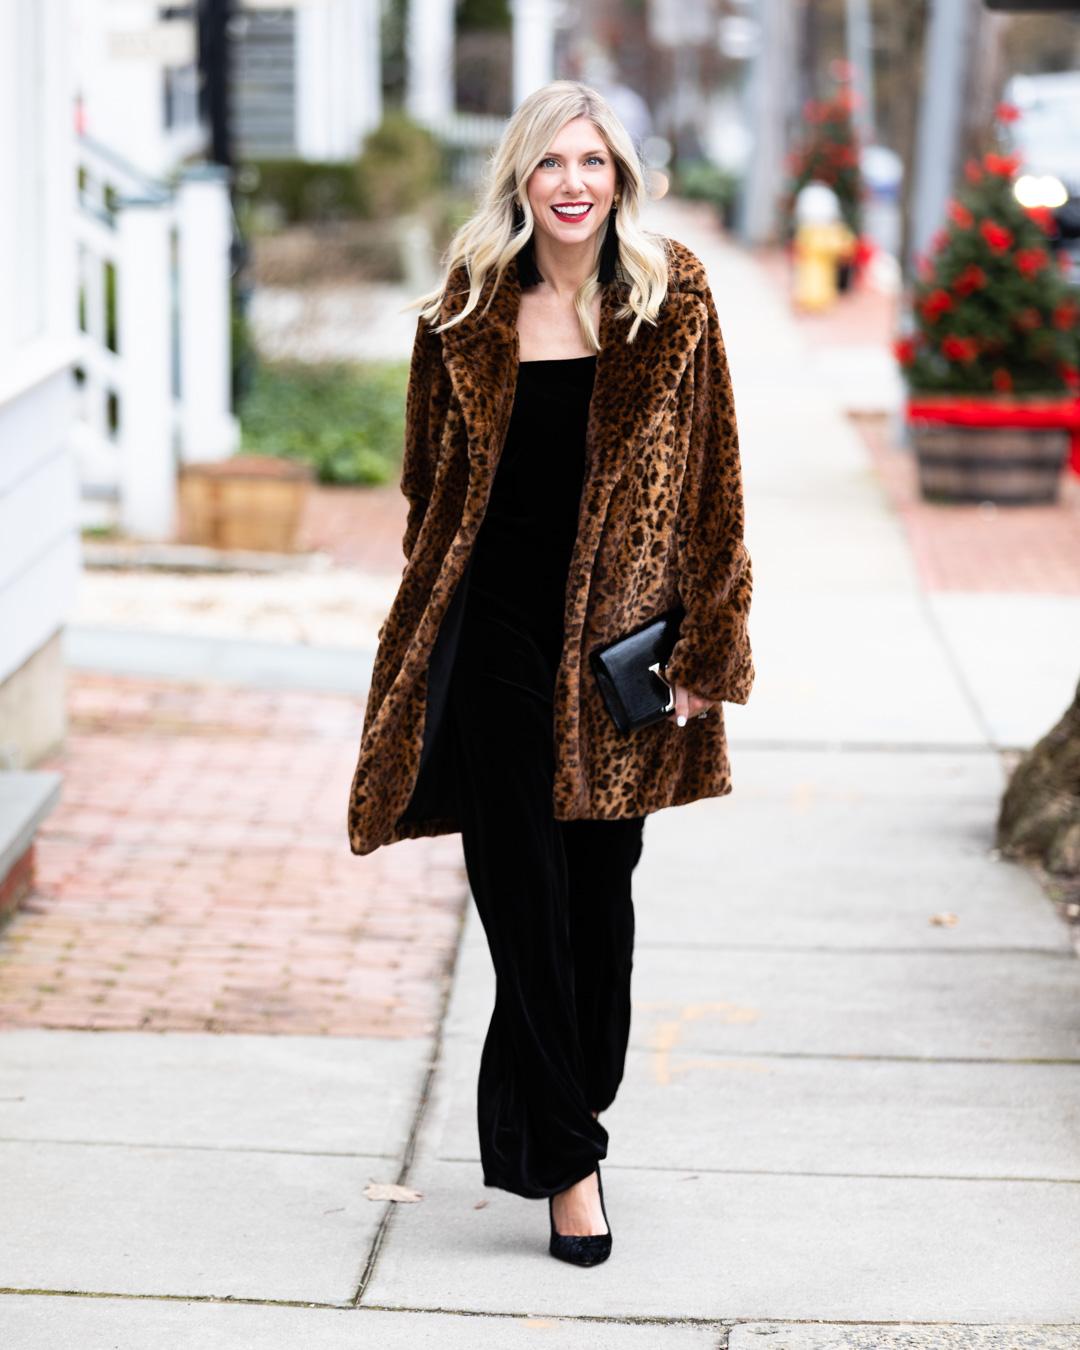 Kensie Velvet Jumpsuit and Leopard Jacket